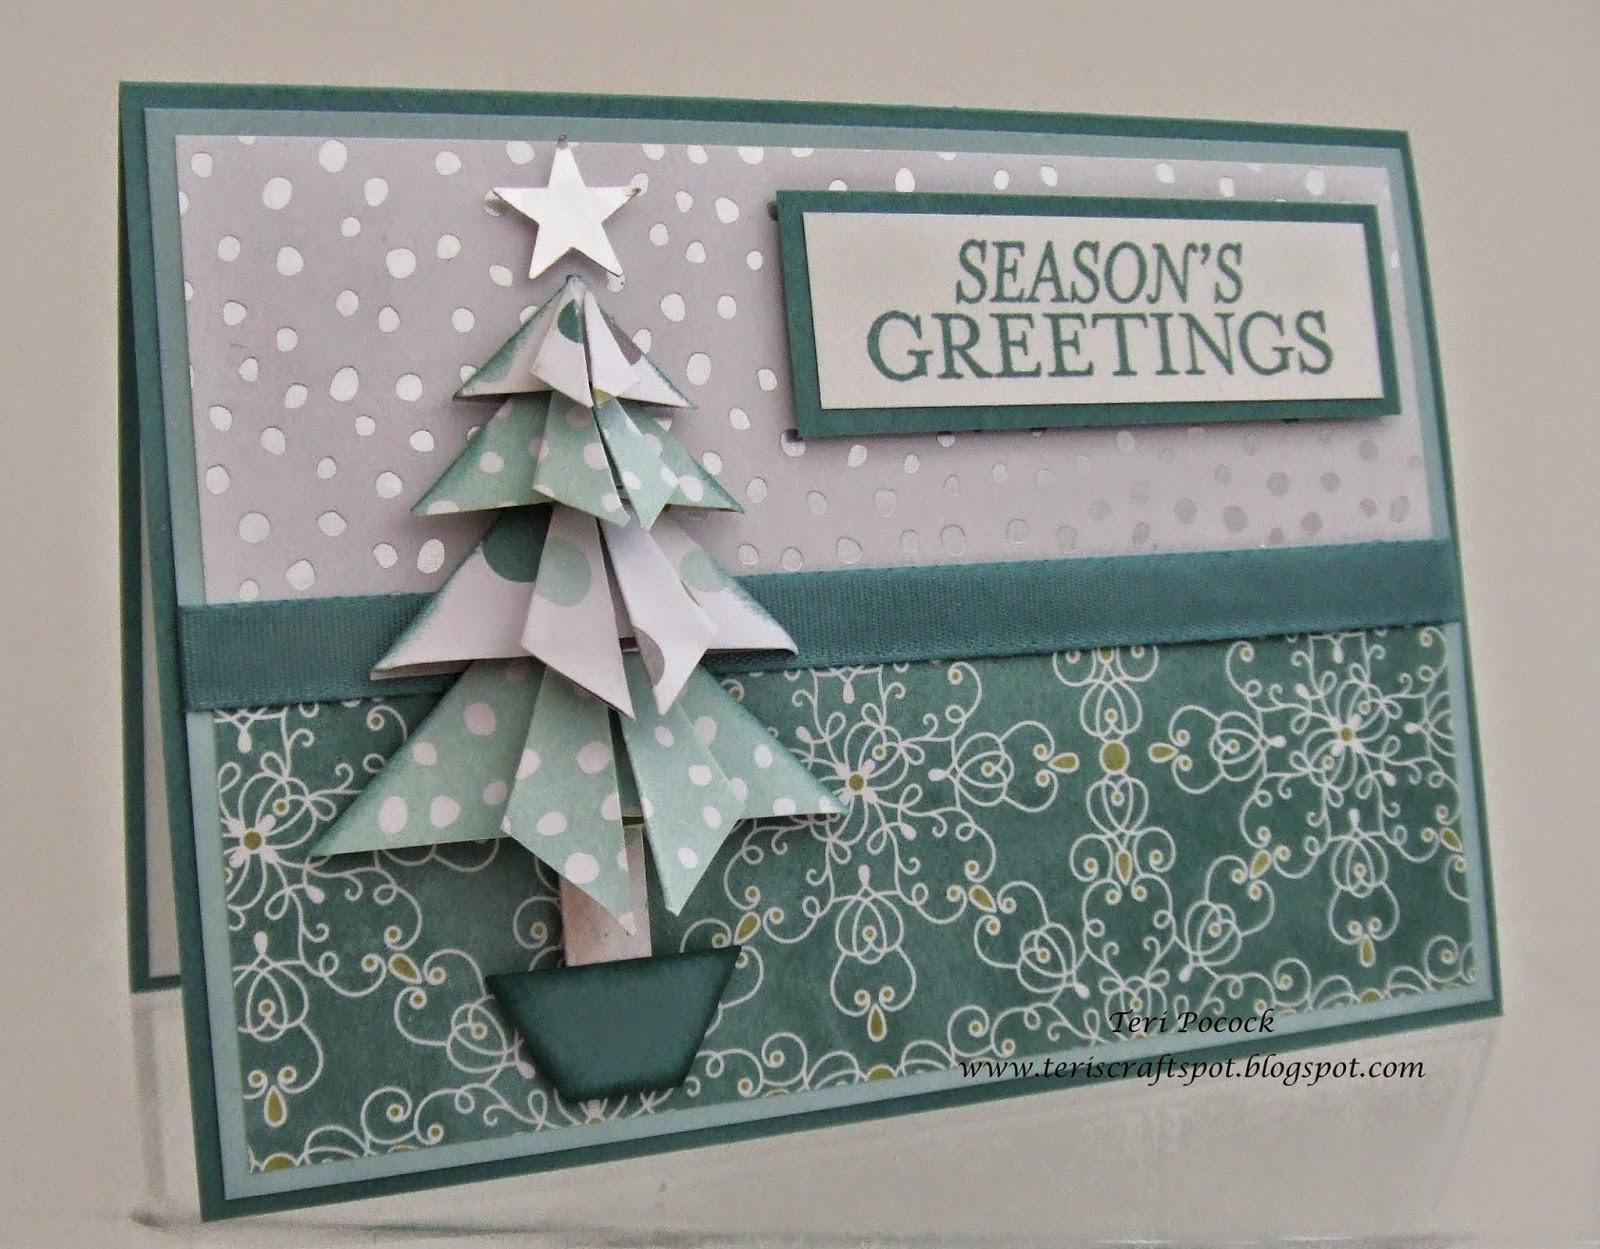 Easy To Make Origami Christmas Tree And Christmas Greeting Cards ... | 1249x1600